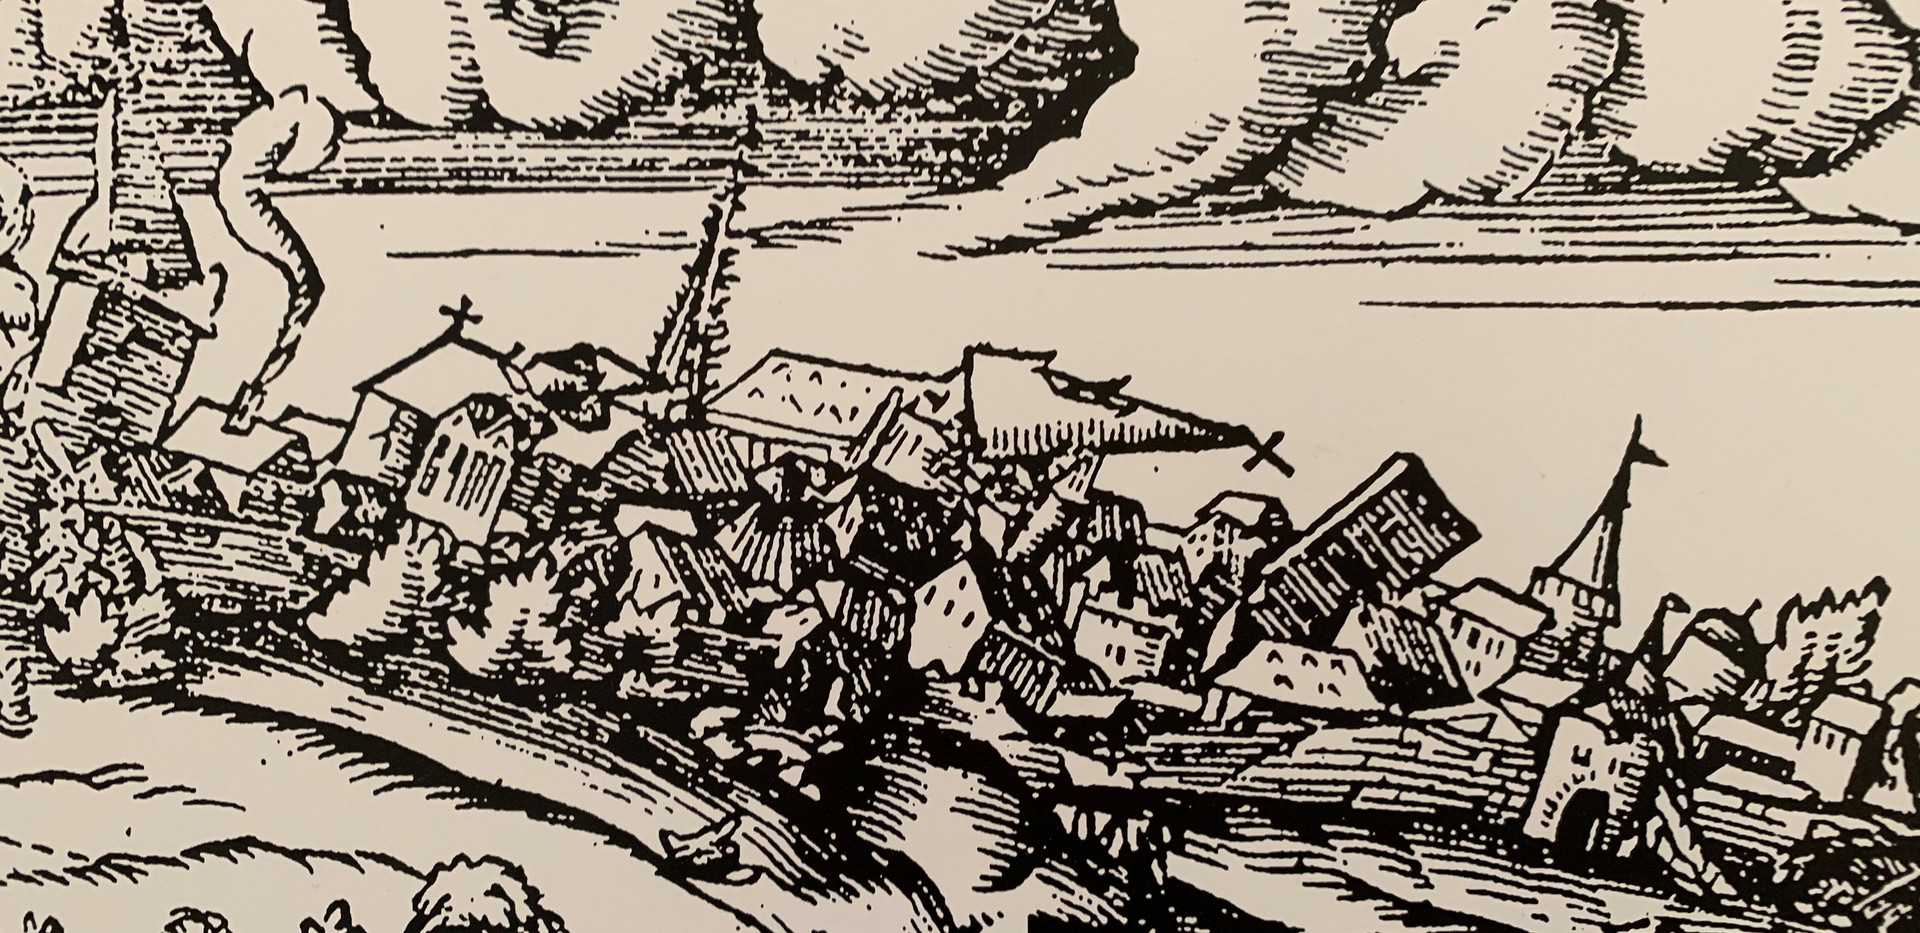 Basler Erdbeben 1356